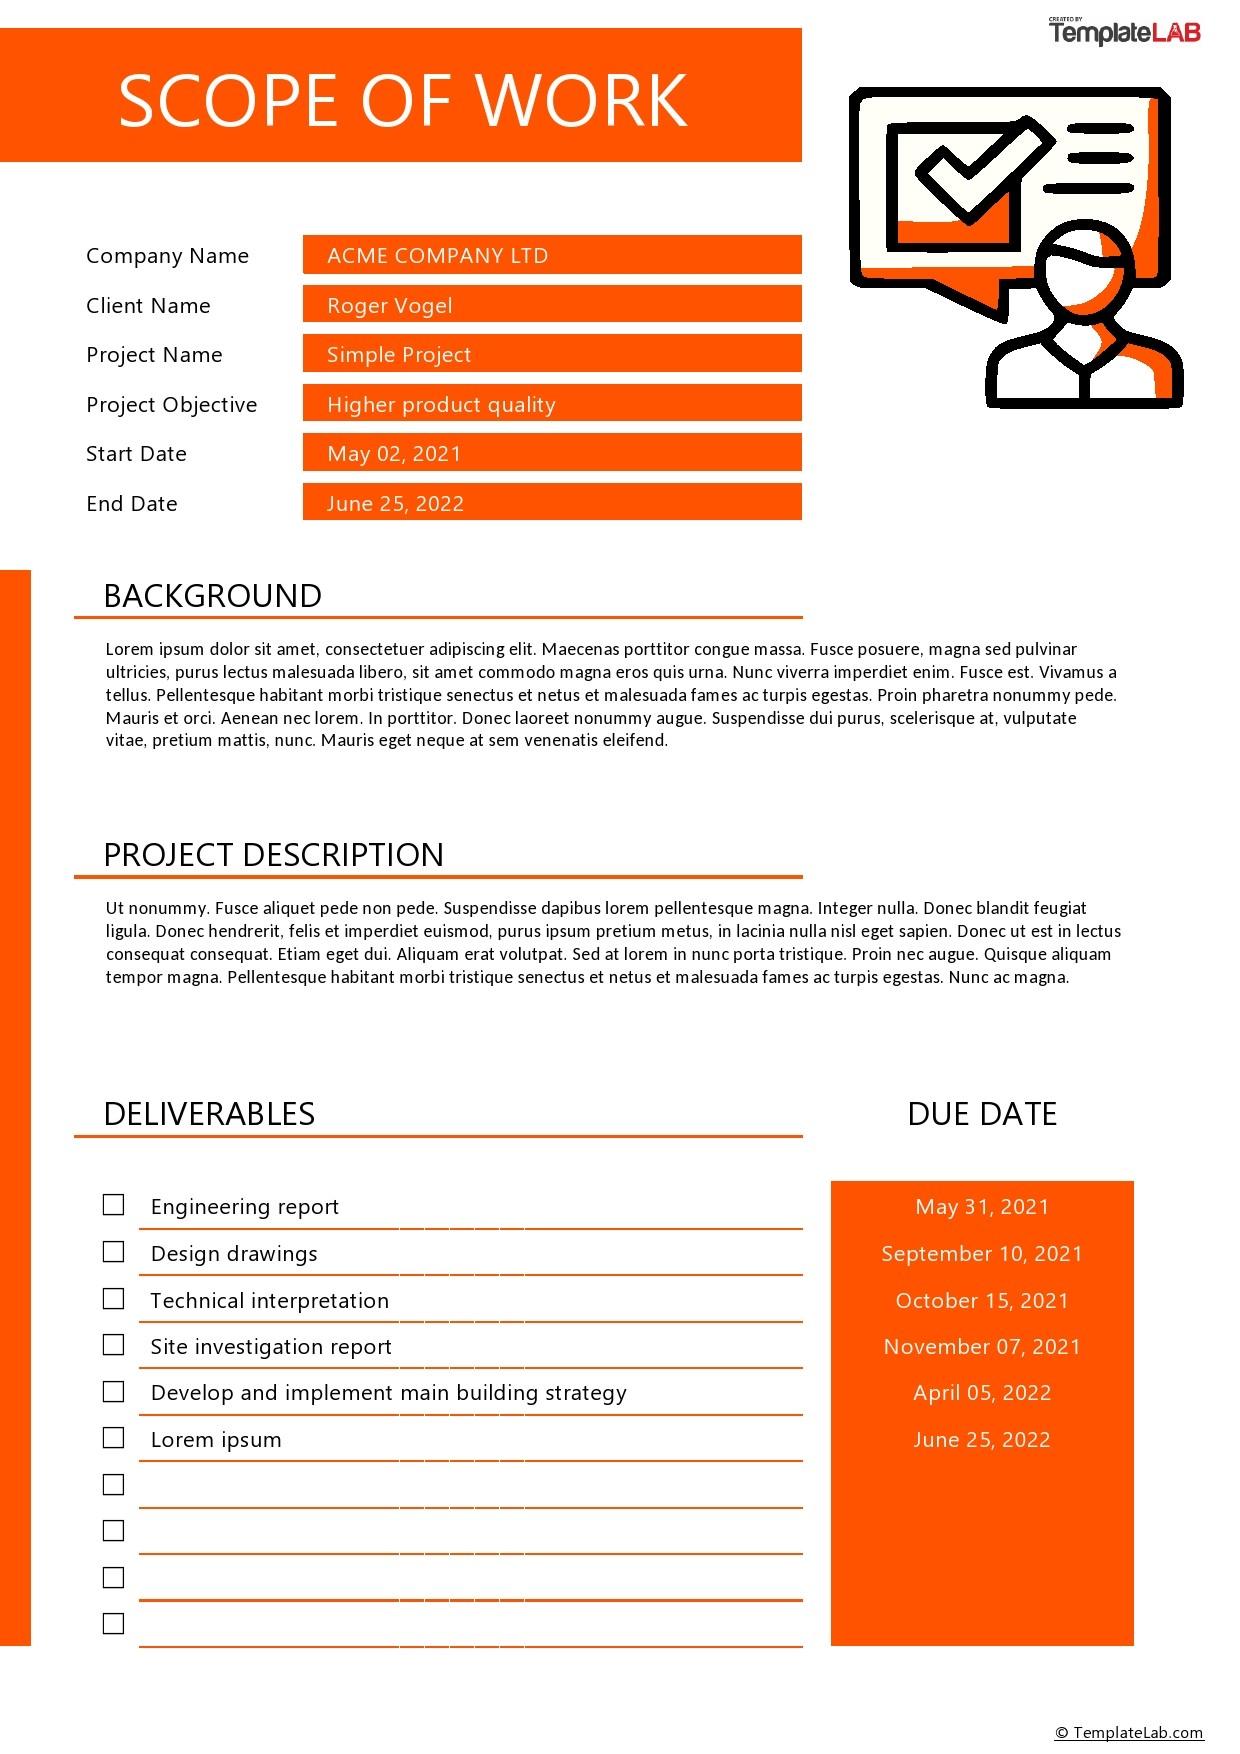 Free Simple Scope of Work Template - TemplateLab.com